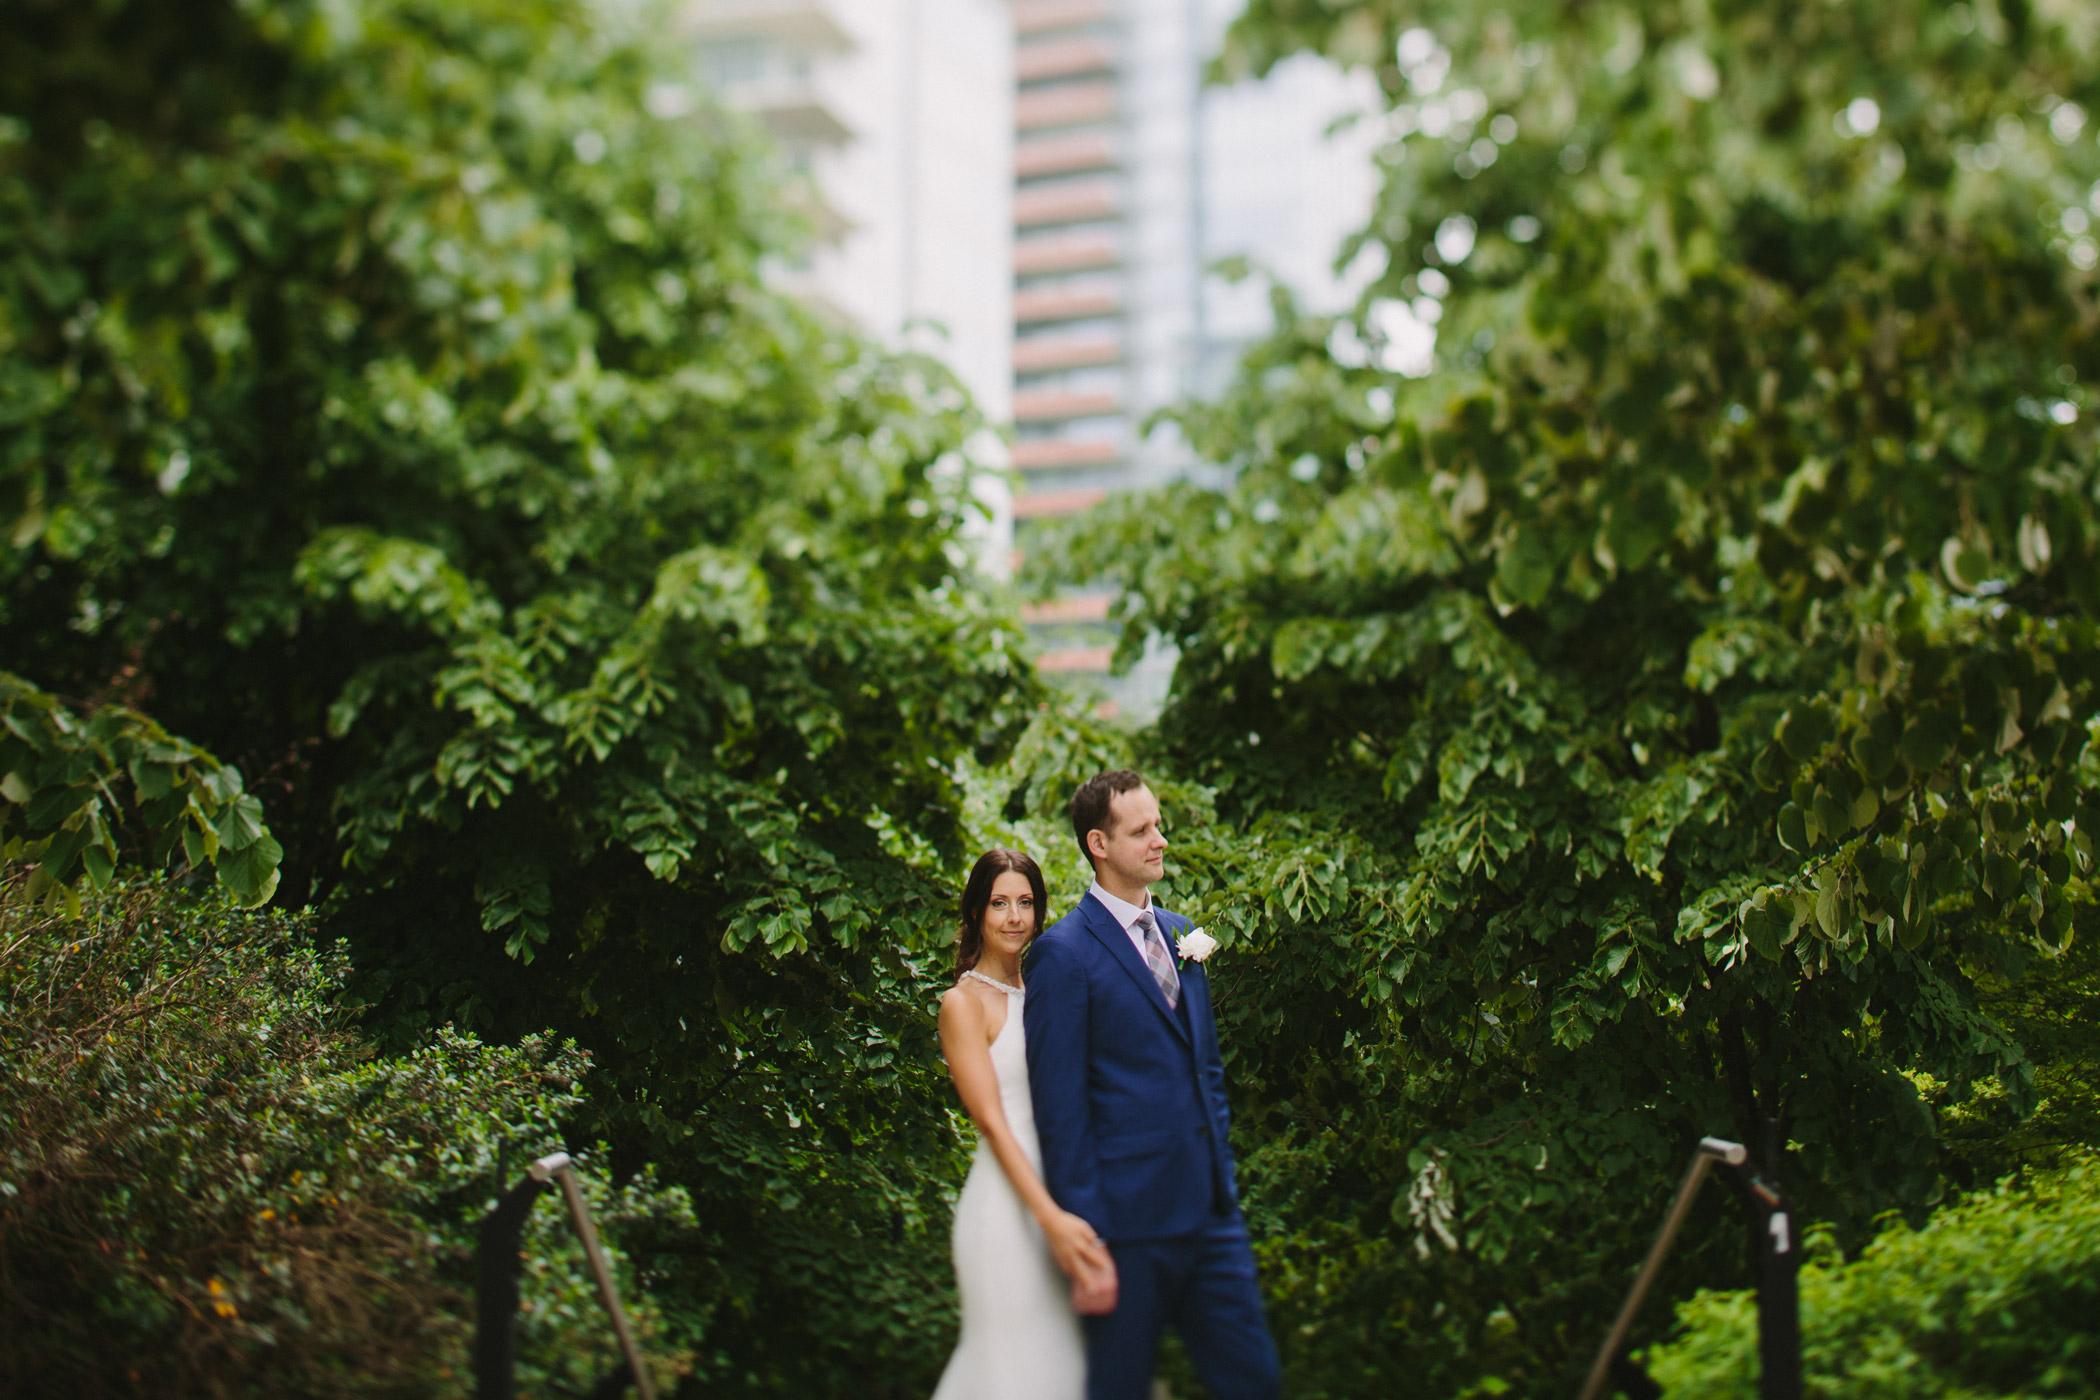 Tilt Shift Wedding Portrait in Coal Harbour